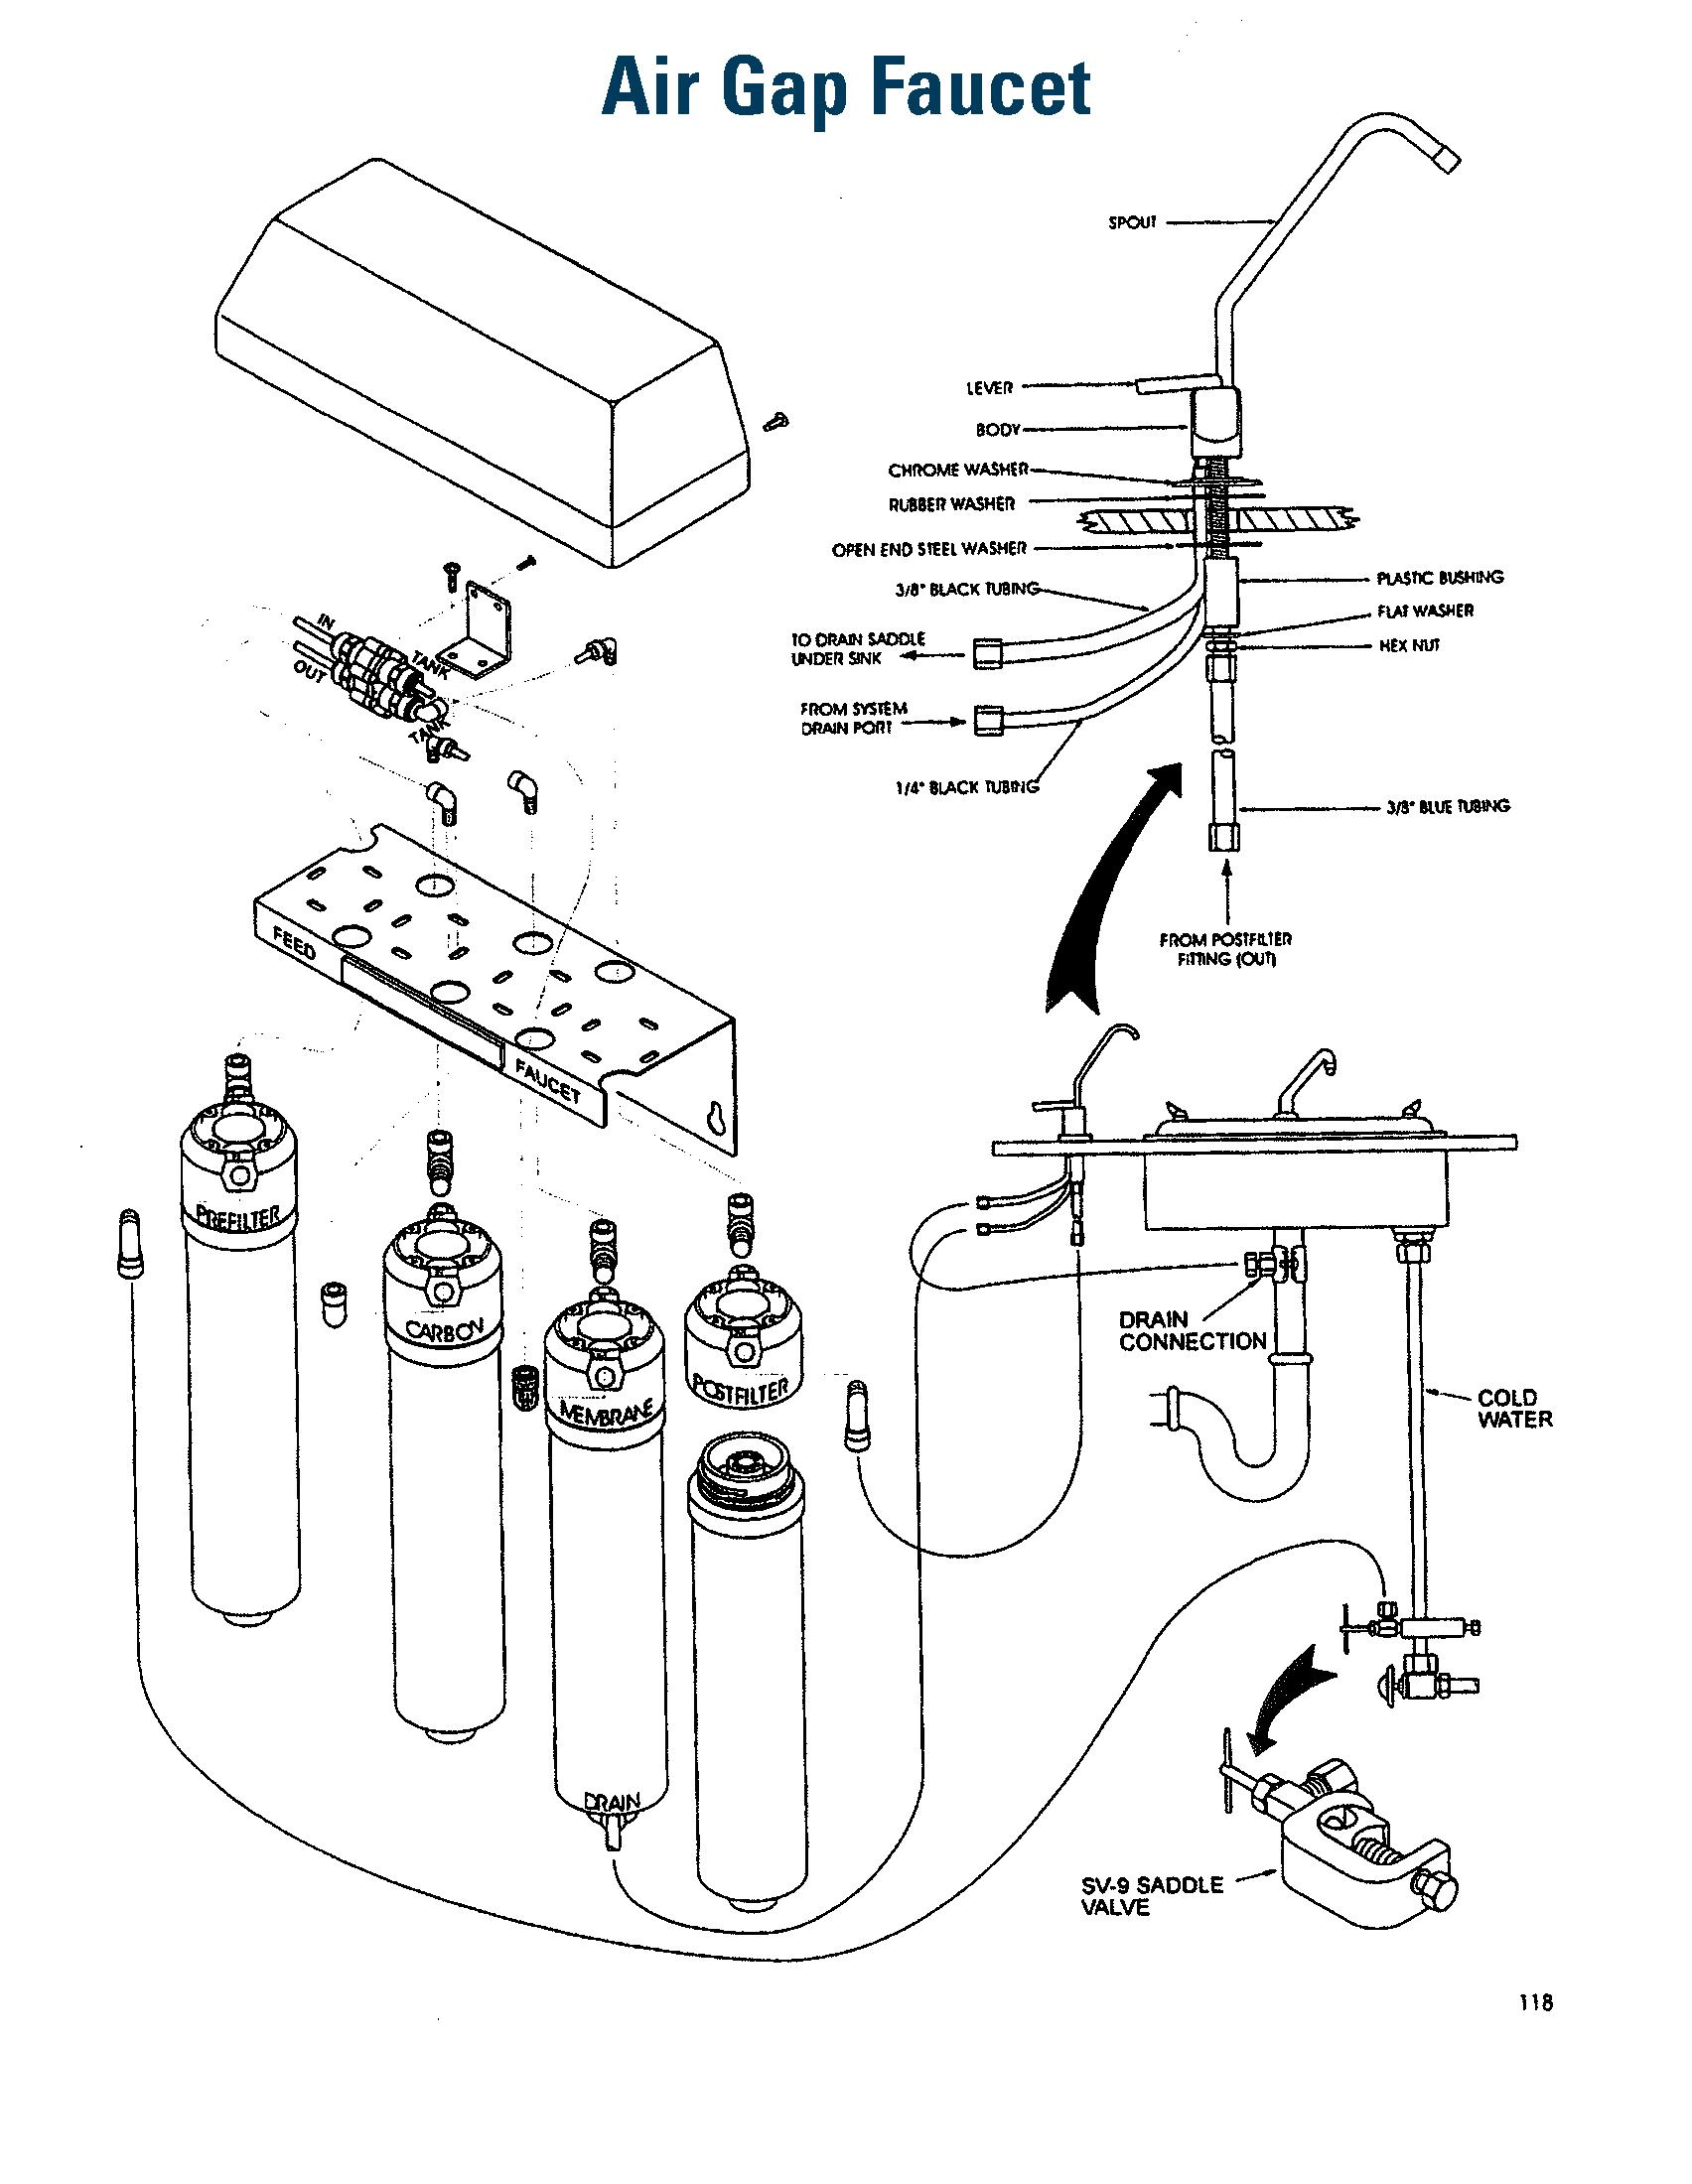 hight resolution of air gap faucet diagram